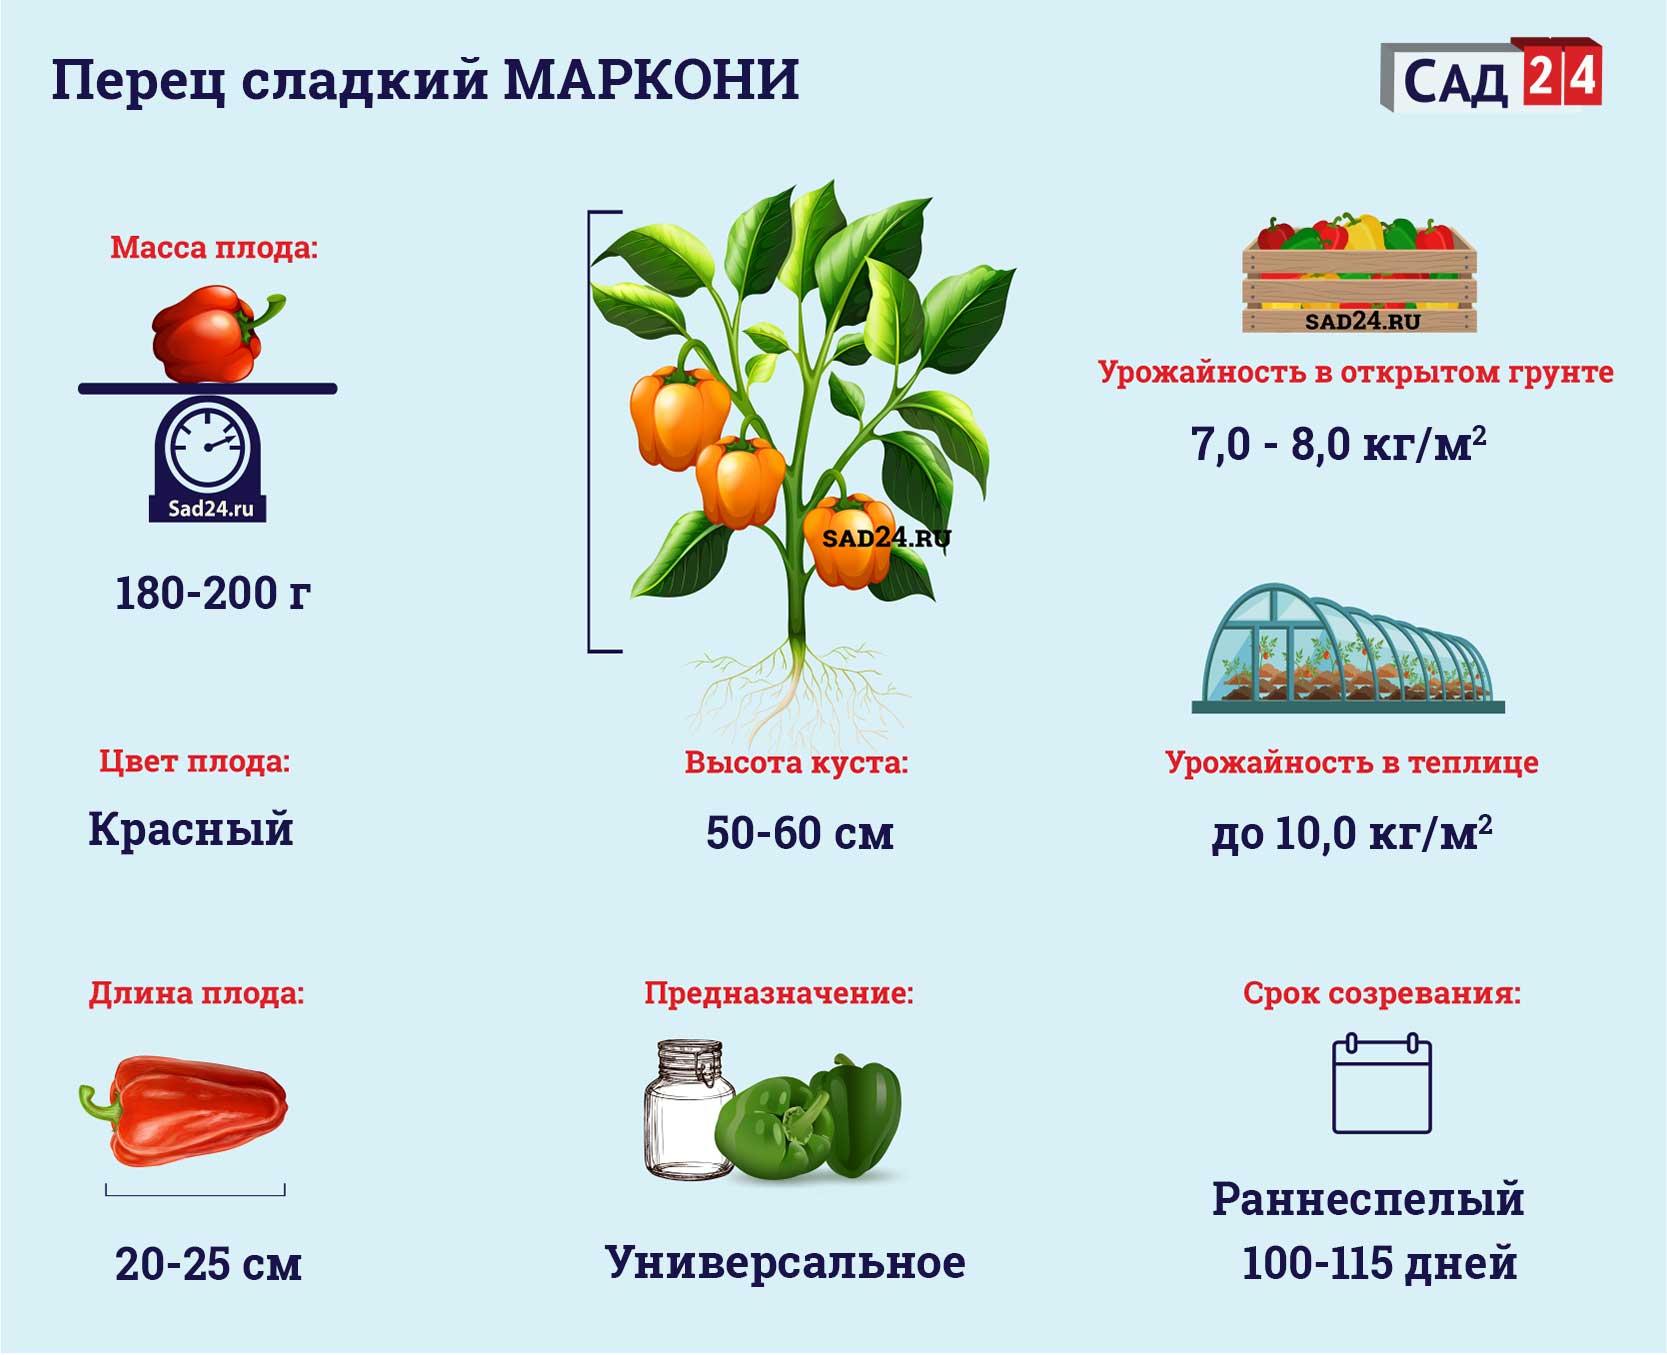 Маркони - https://sad24.ru